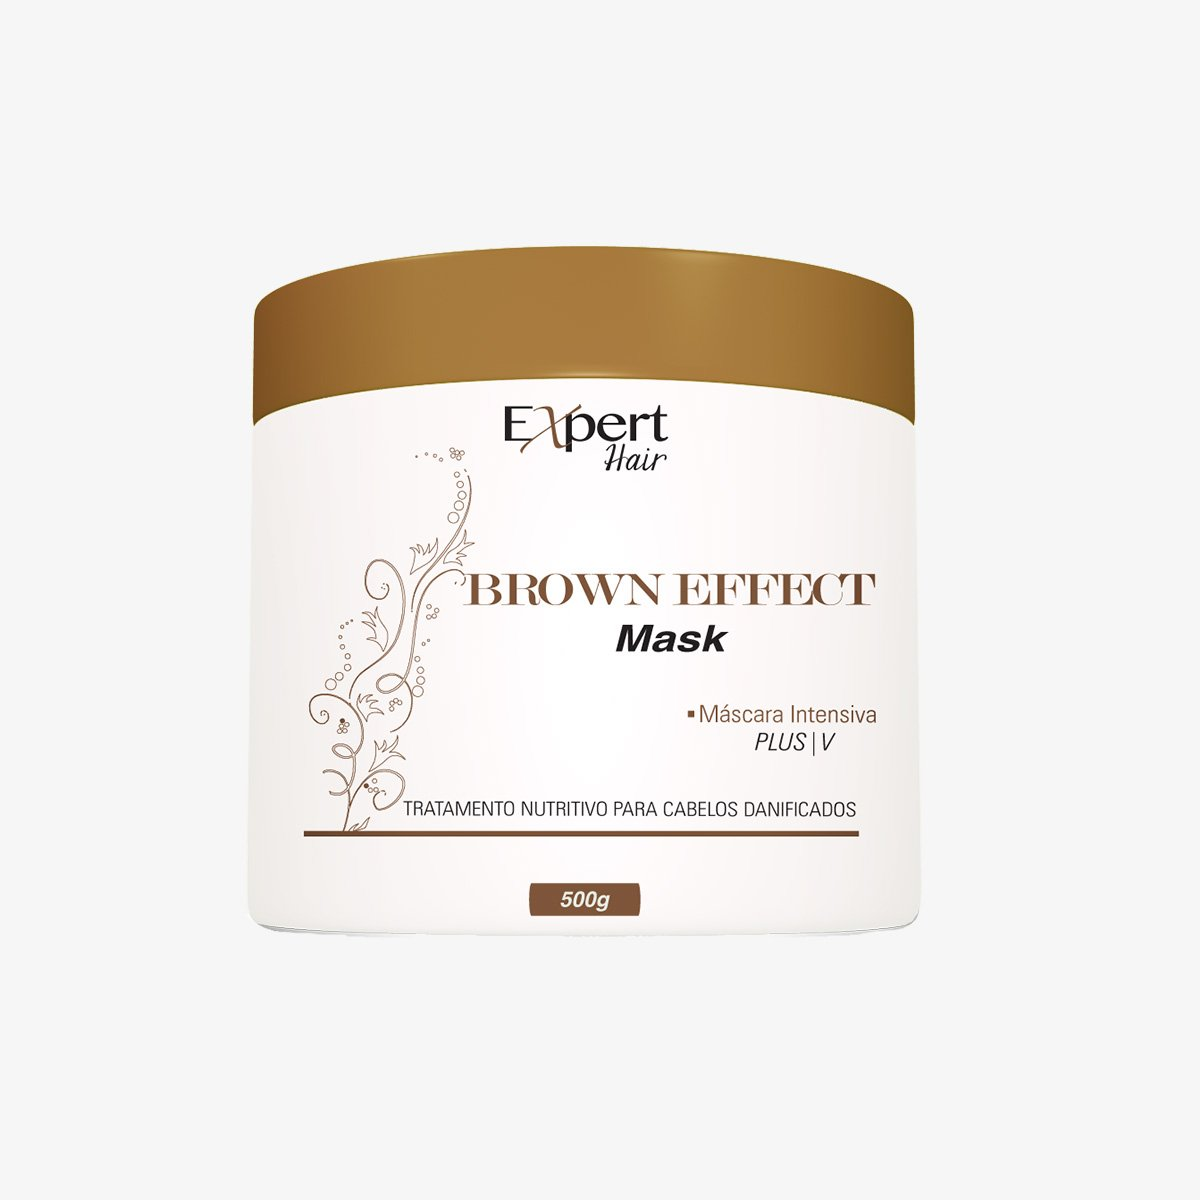 Cheap BROWN EFFECT Mask hot sale